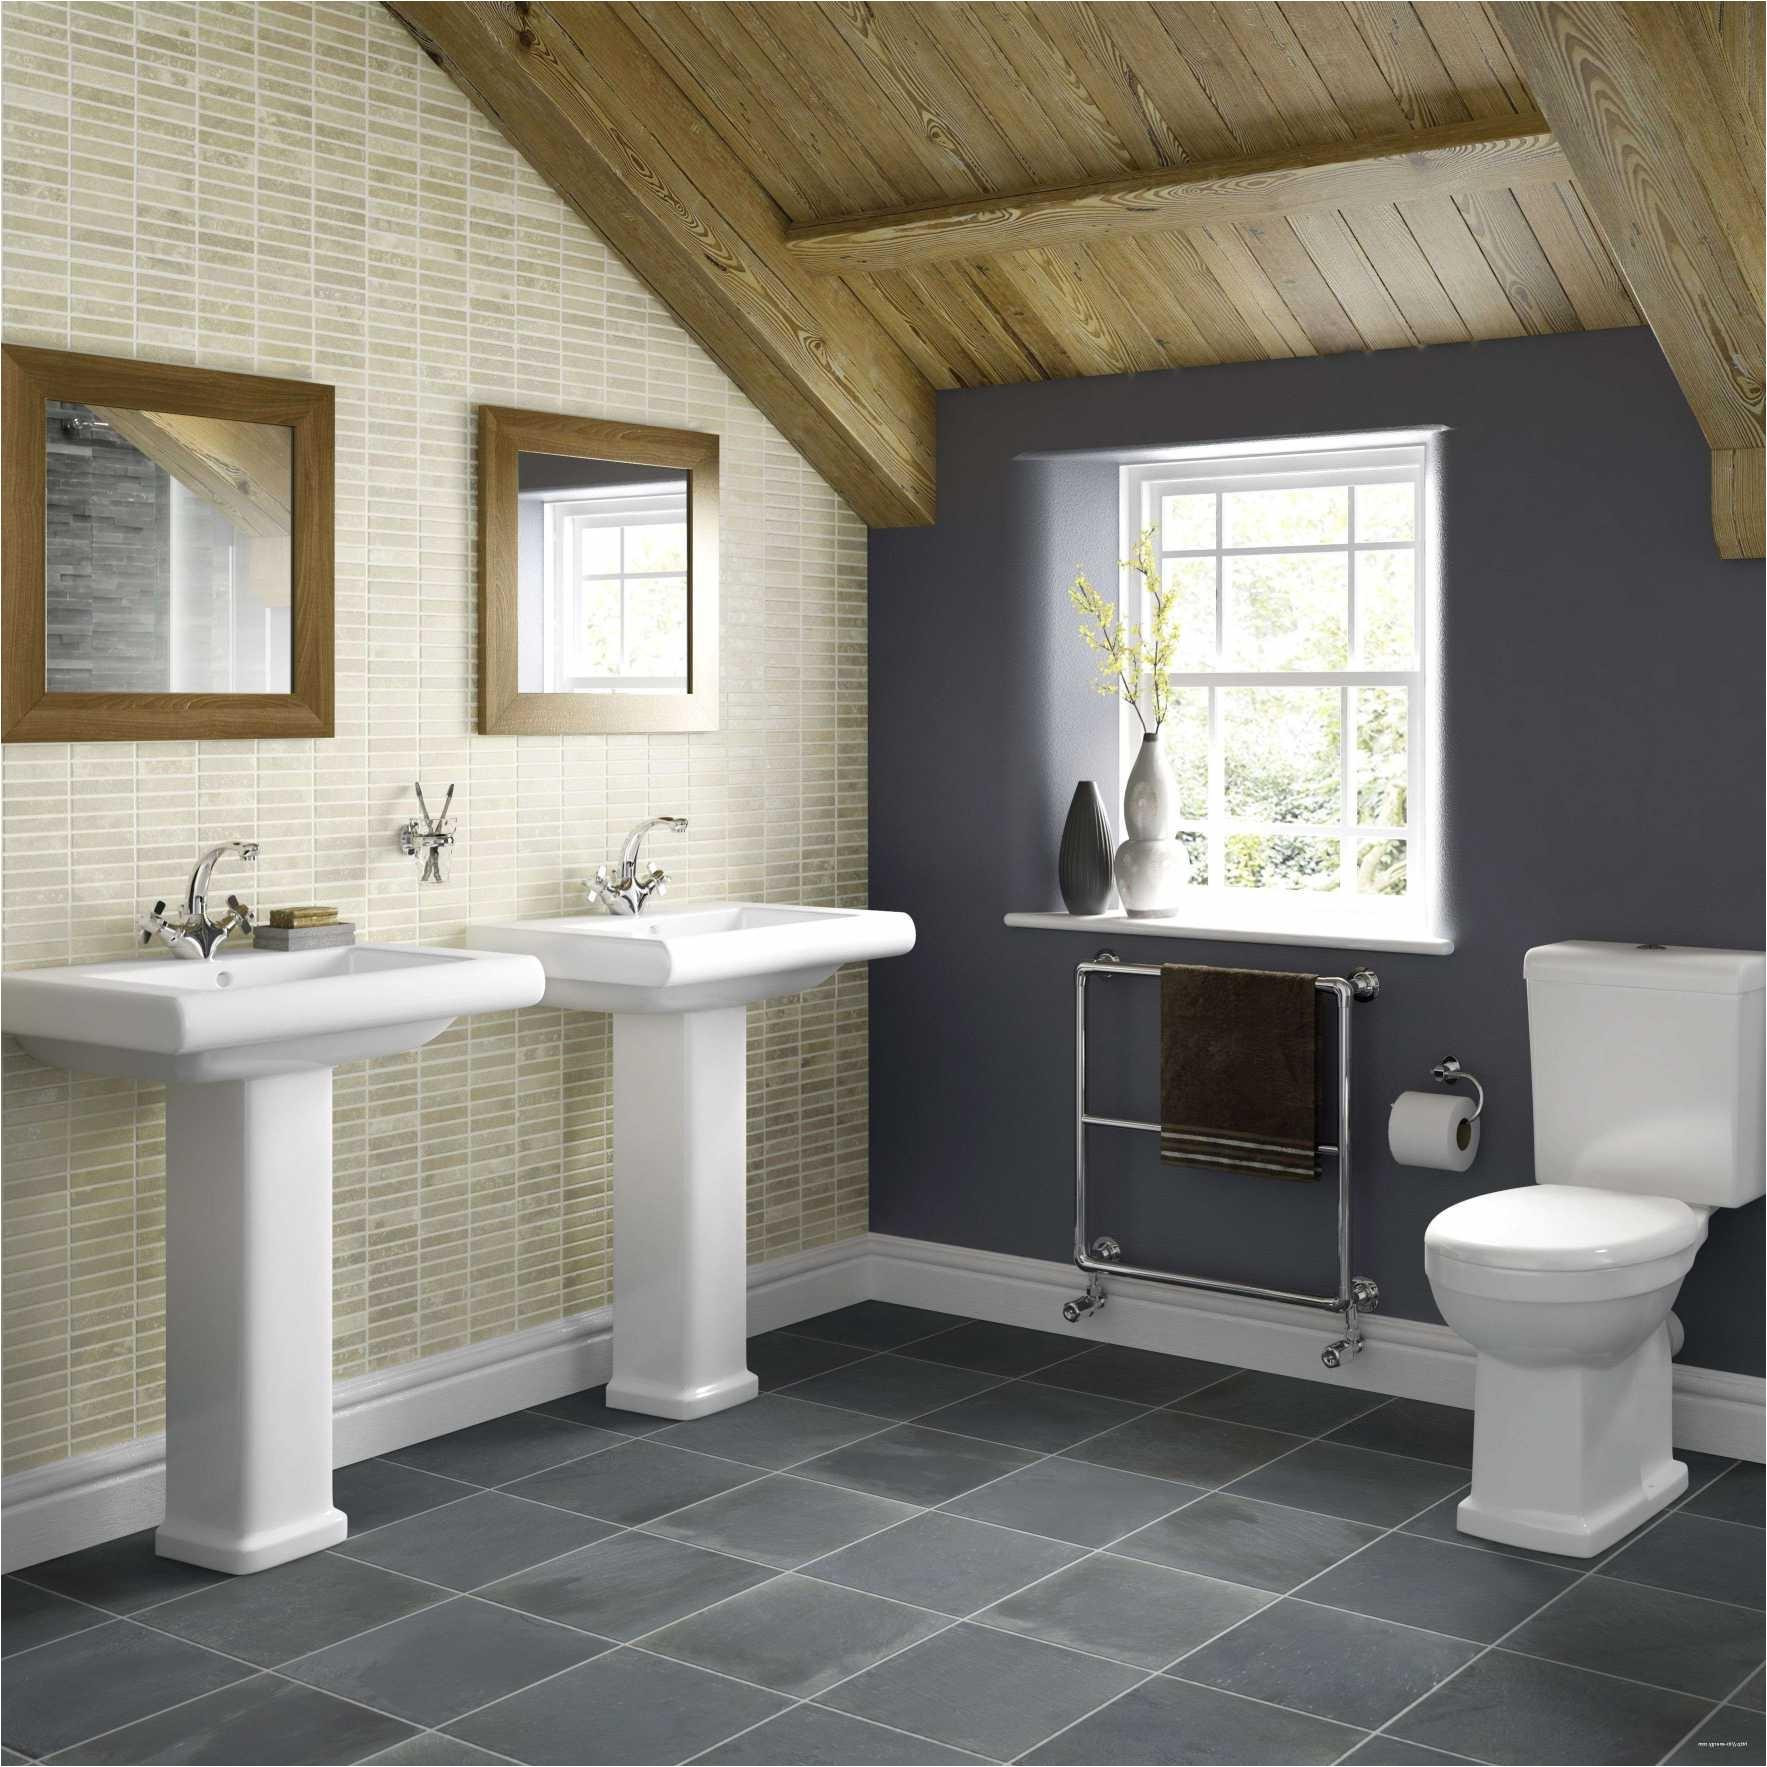 porcelanosa bathroom lovely fresh bathroom picture ideas lovely tag toilet ideas 0d best of 25 best